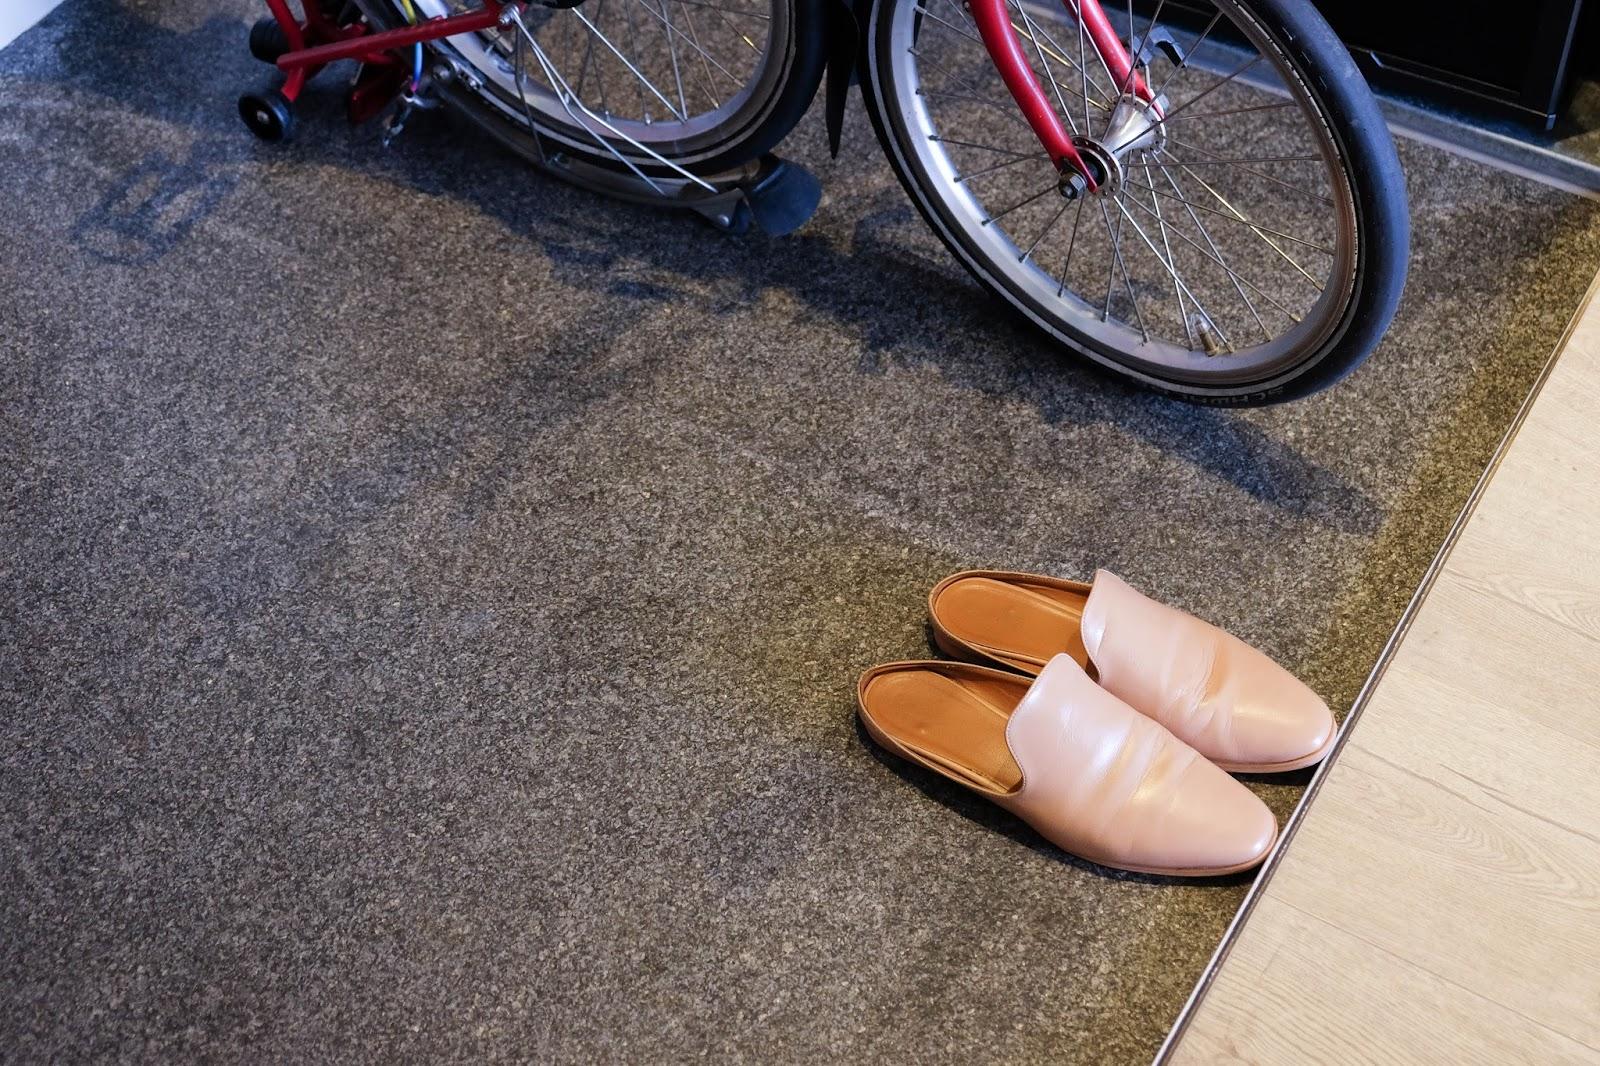 kadda cycling hotel 雙人房